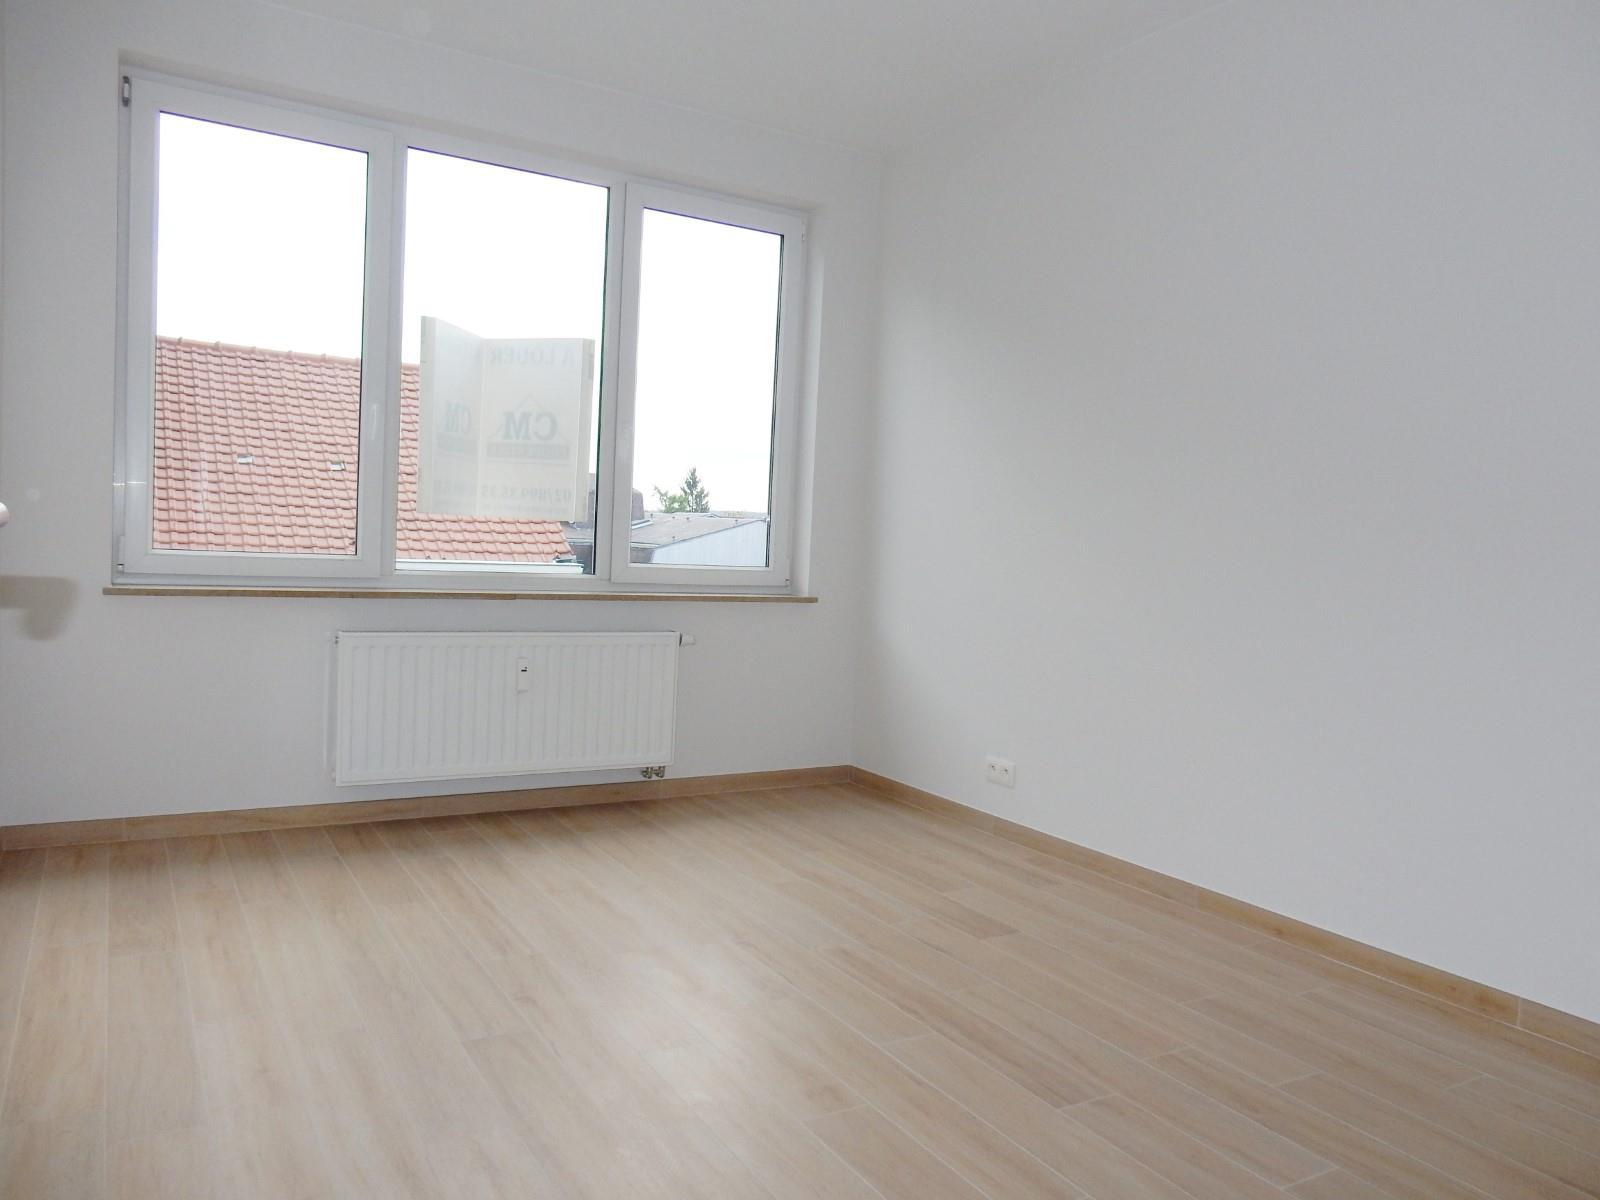 Appartement - Auderghem - #3729581-3